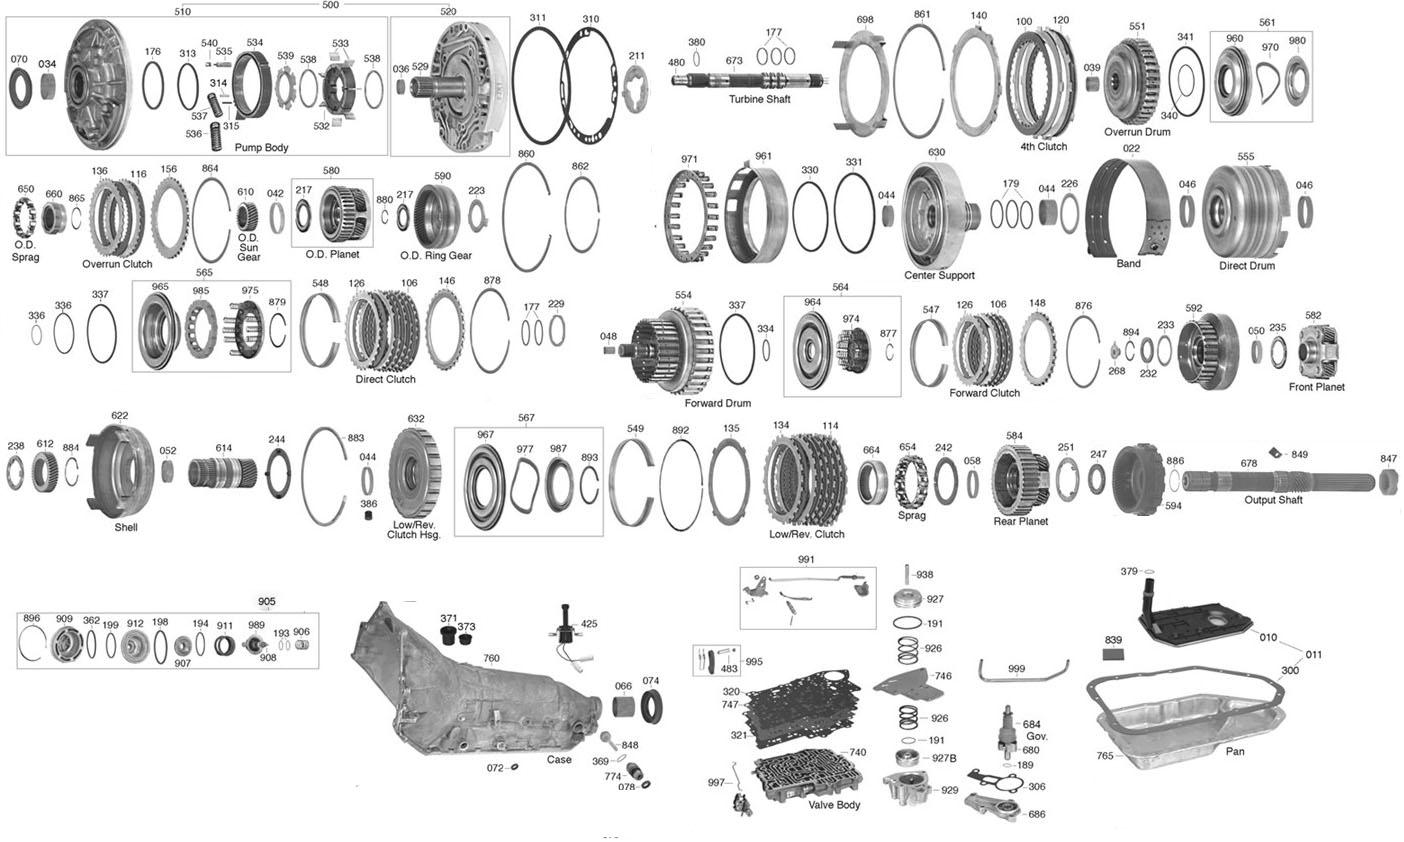 Chevy 700r4 Transmission Rebuild Diagram